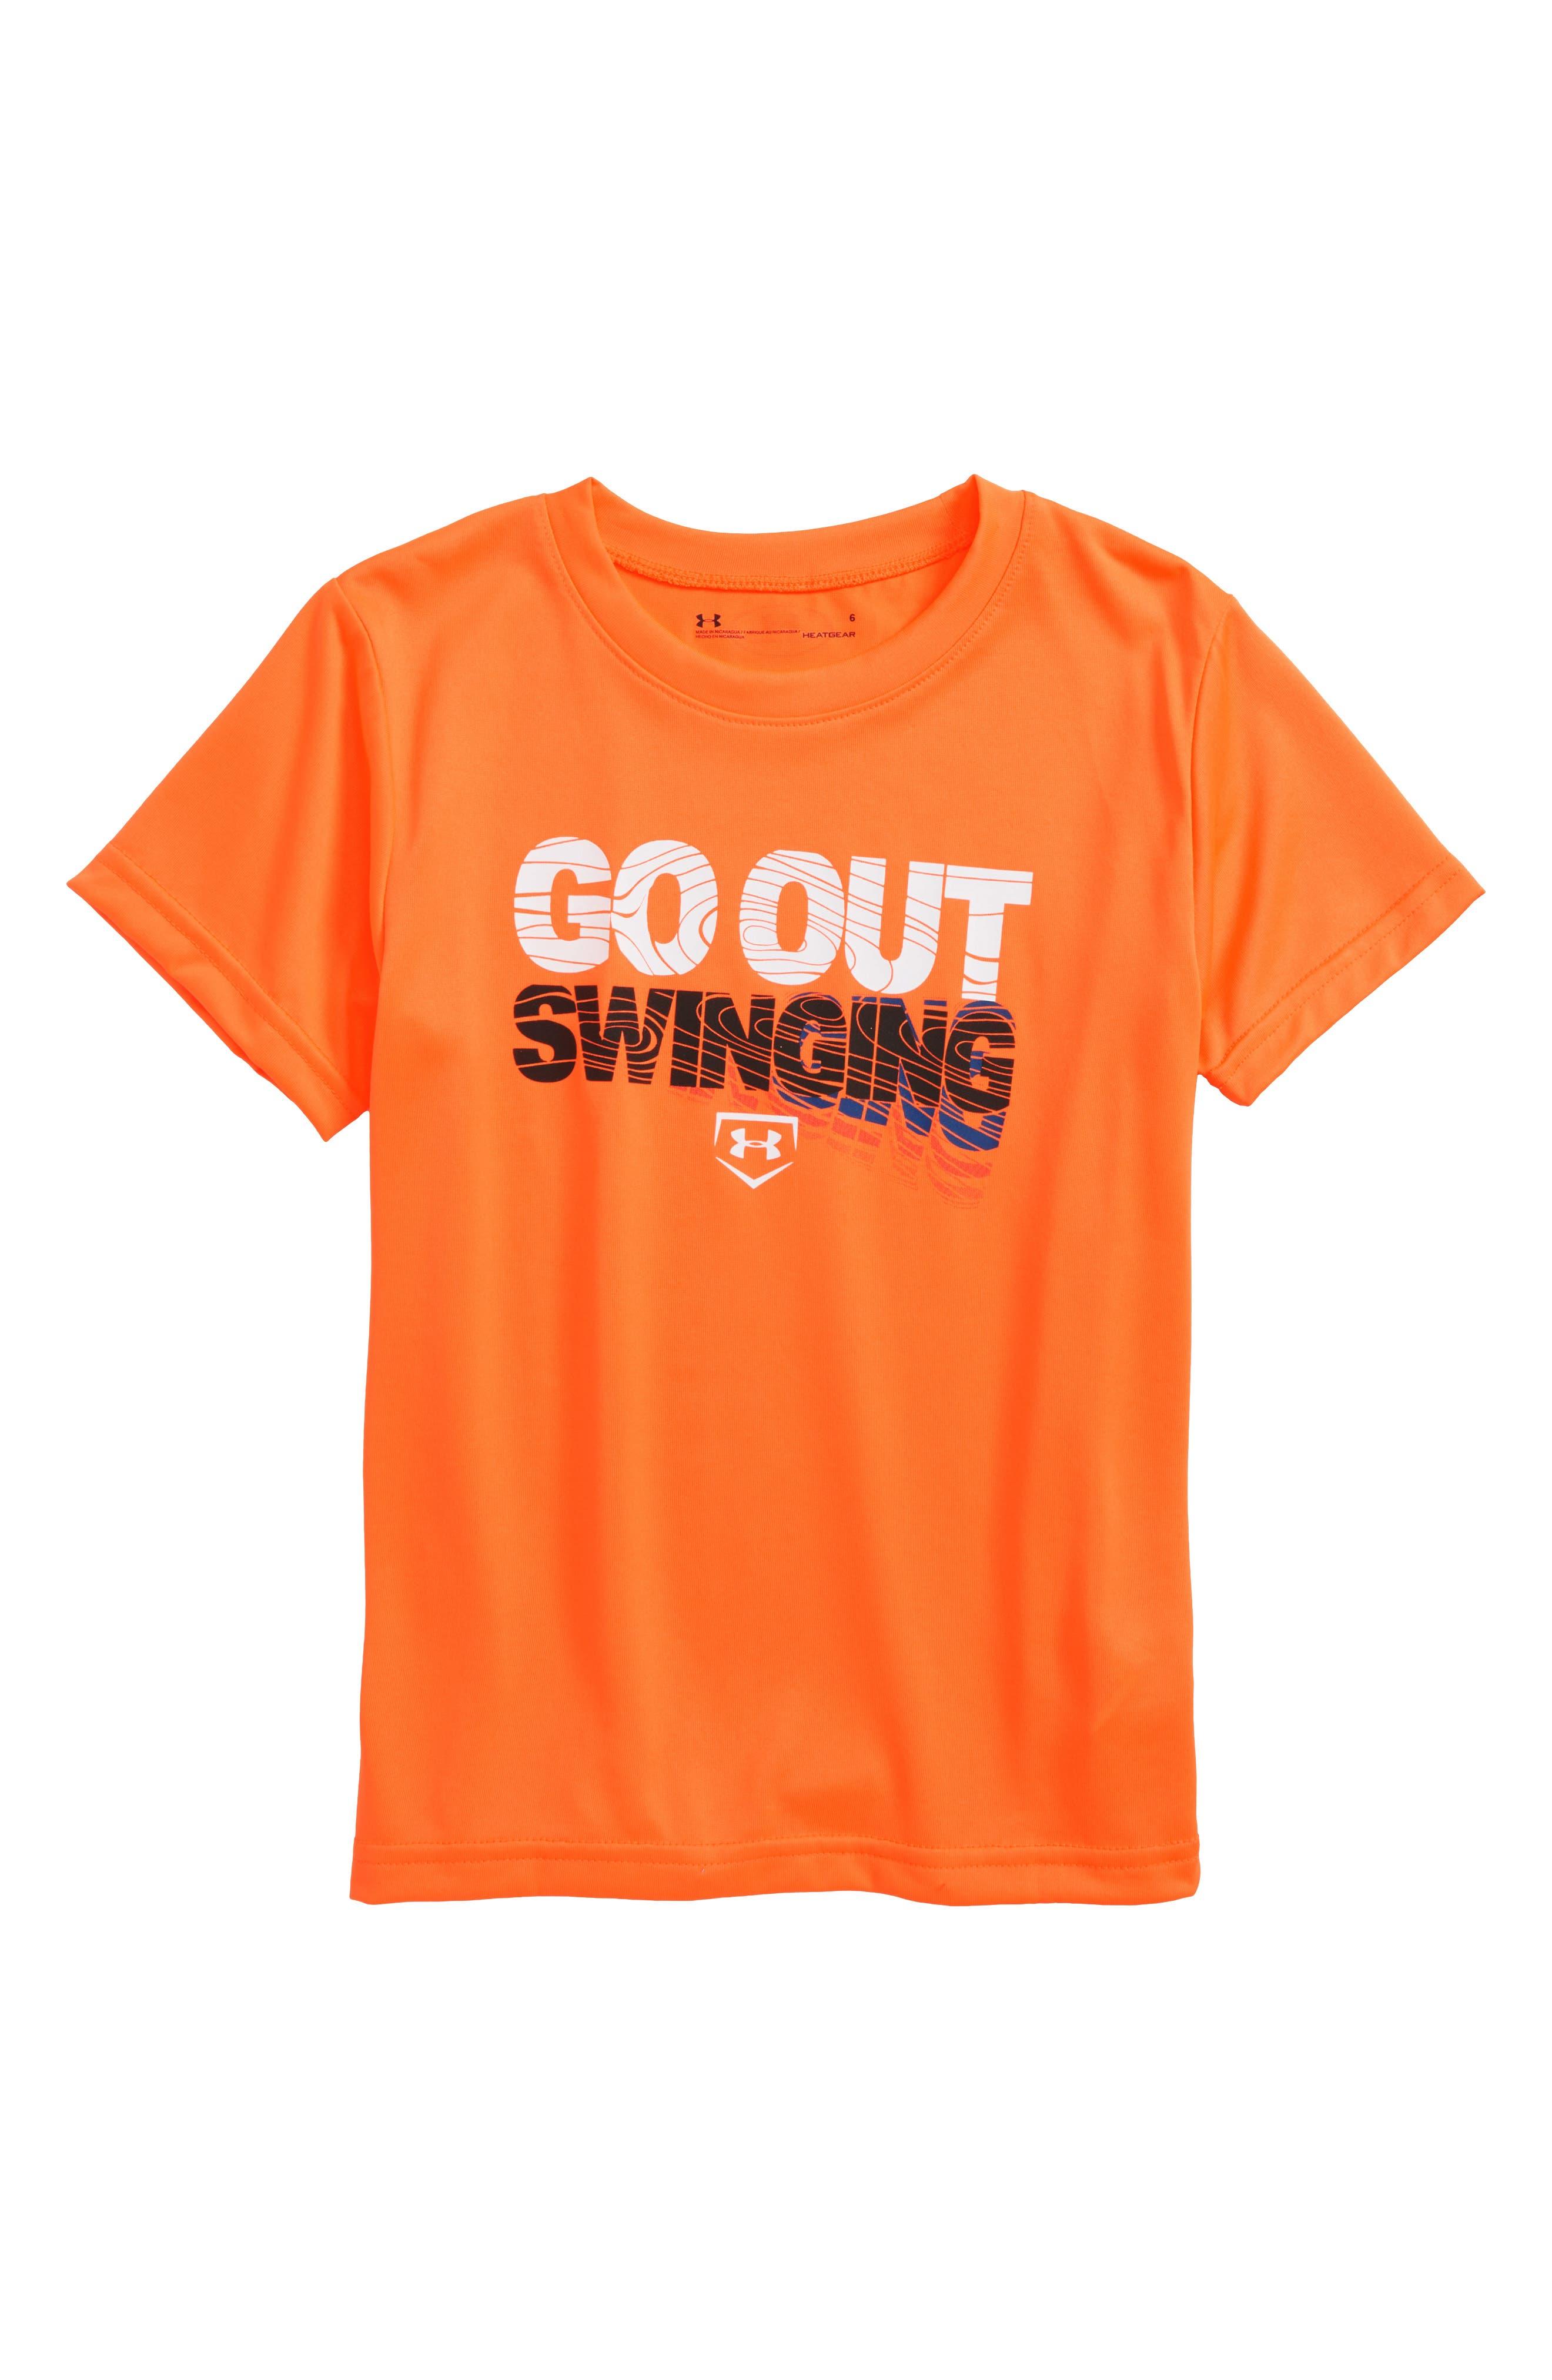 Under Armour Go Out Swinging HeatGear® T-Shirt (Toddler Boys & Little Boys)